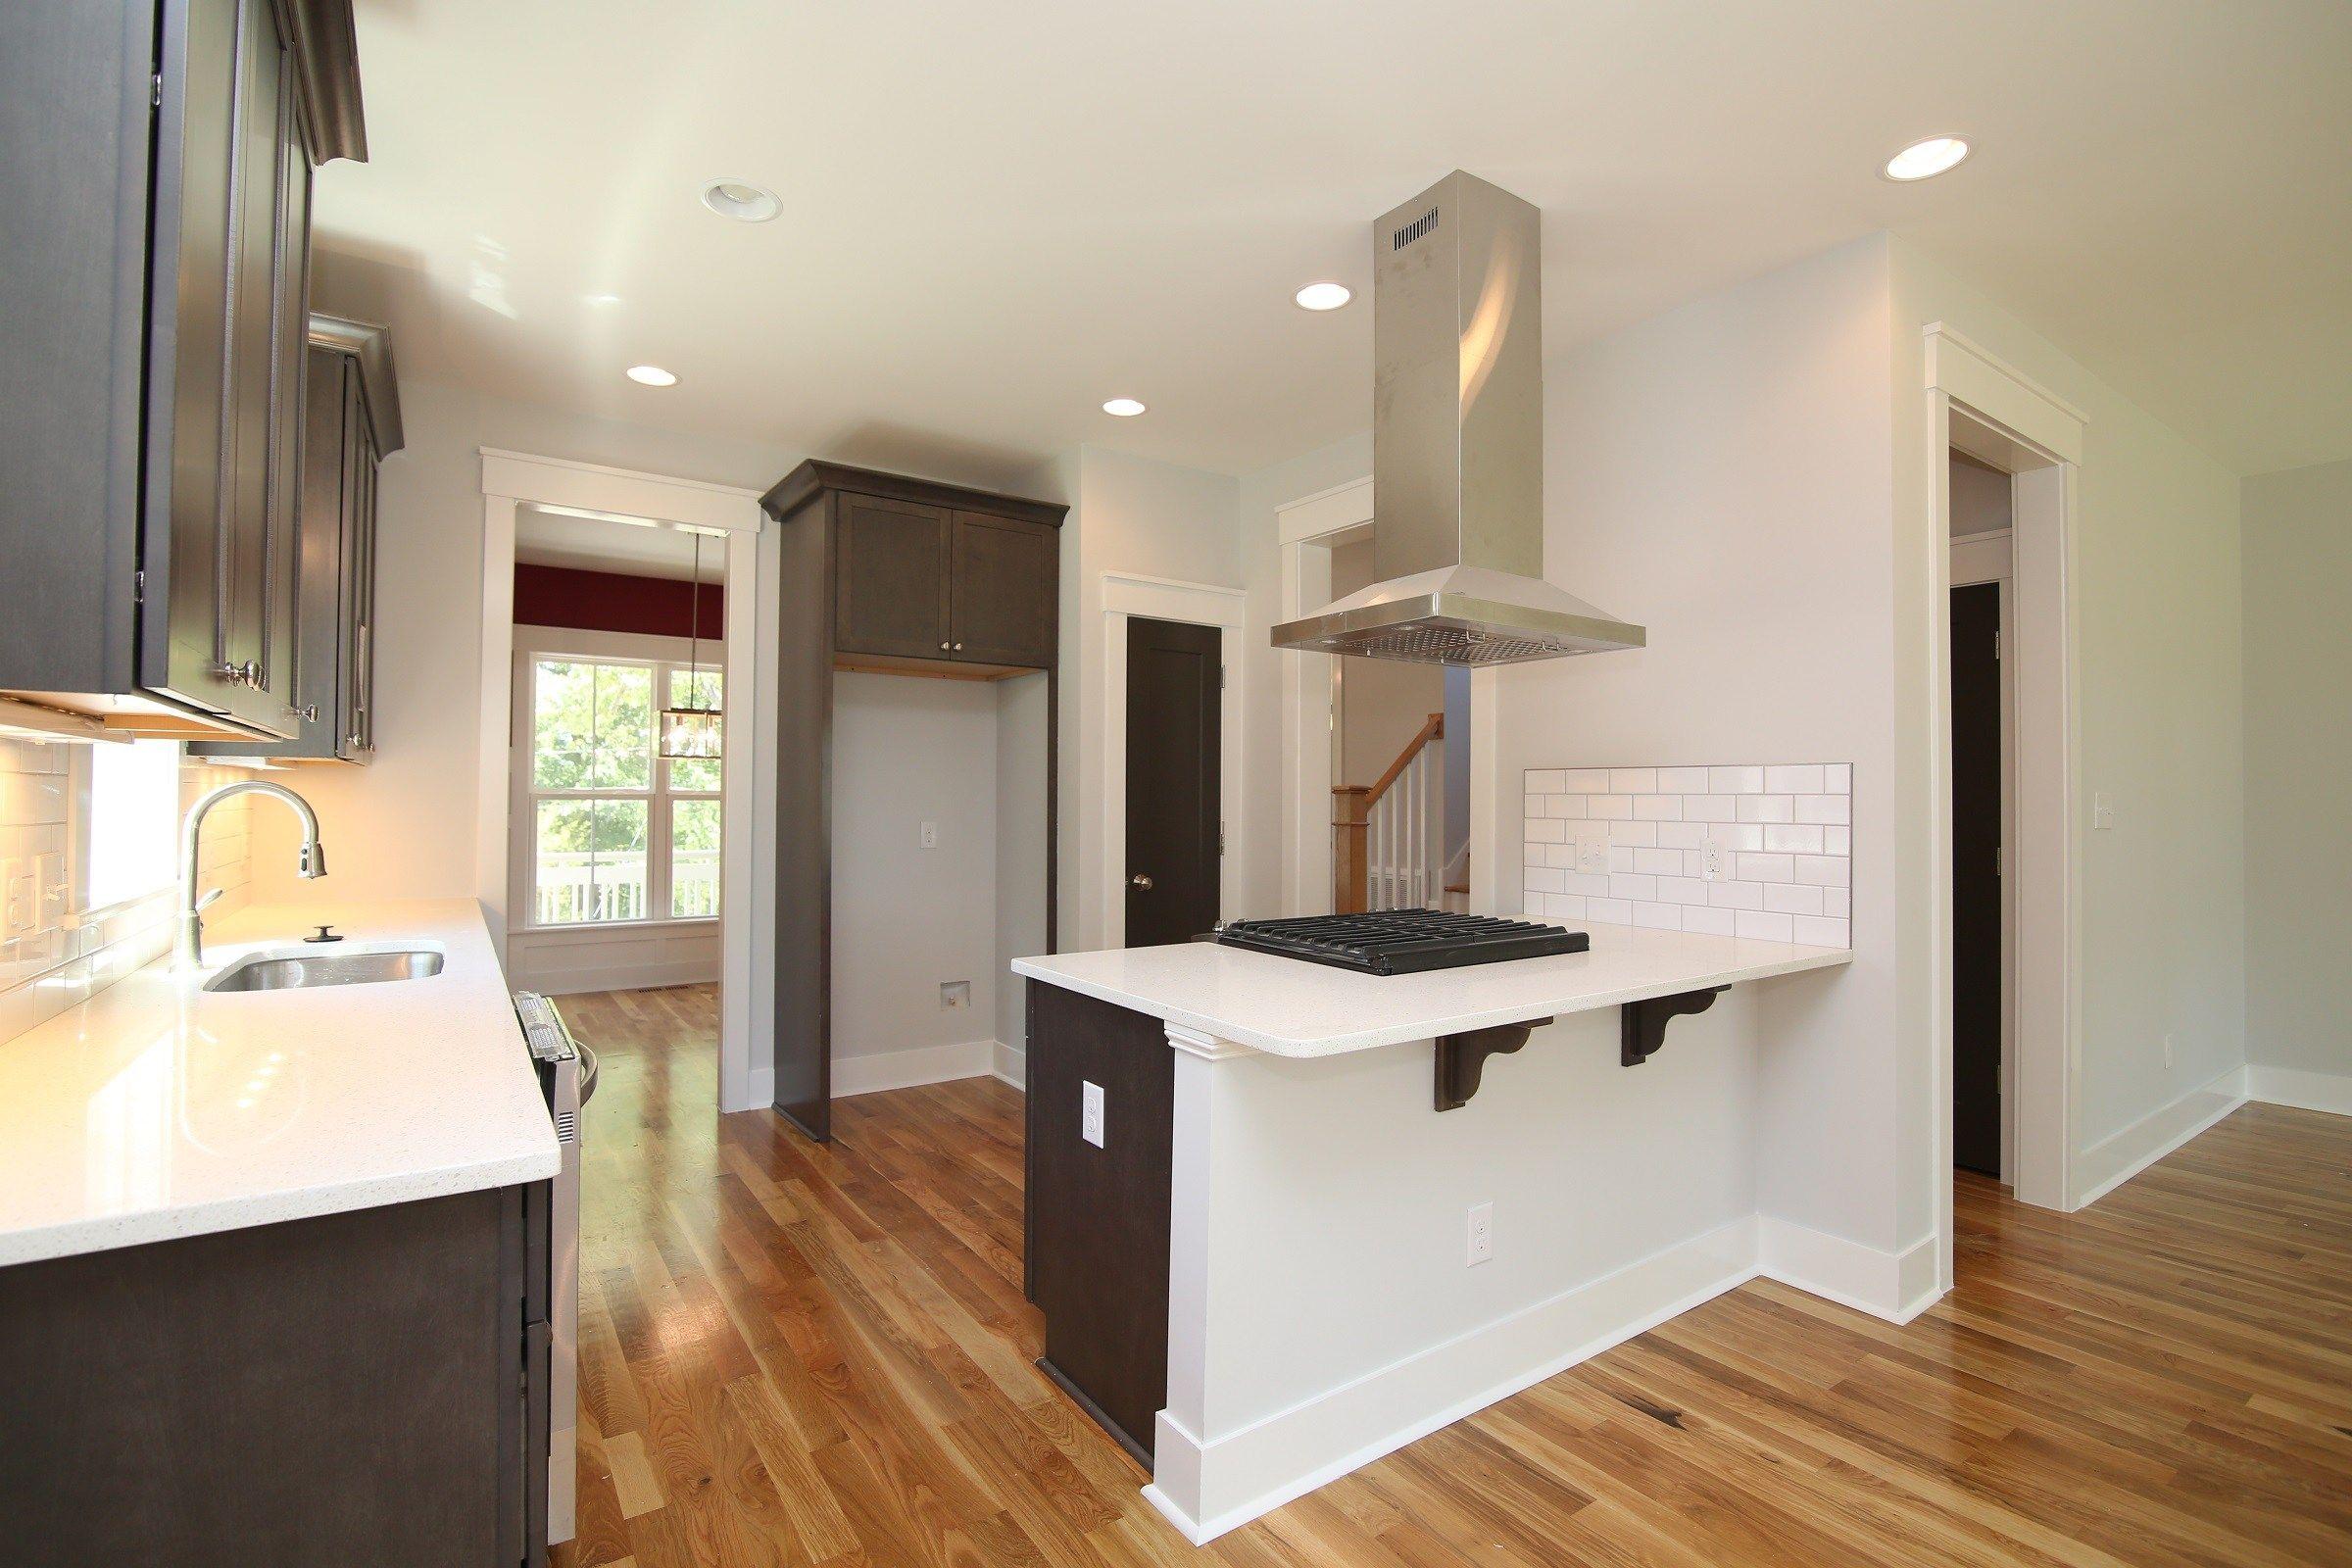 1001 Fargo Durham NC 27705 | Thayer Homes | Home, Home ...